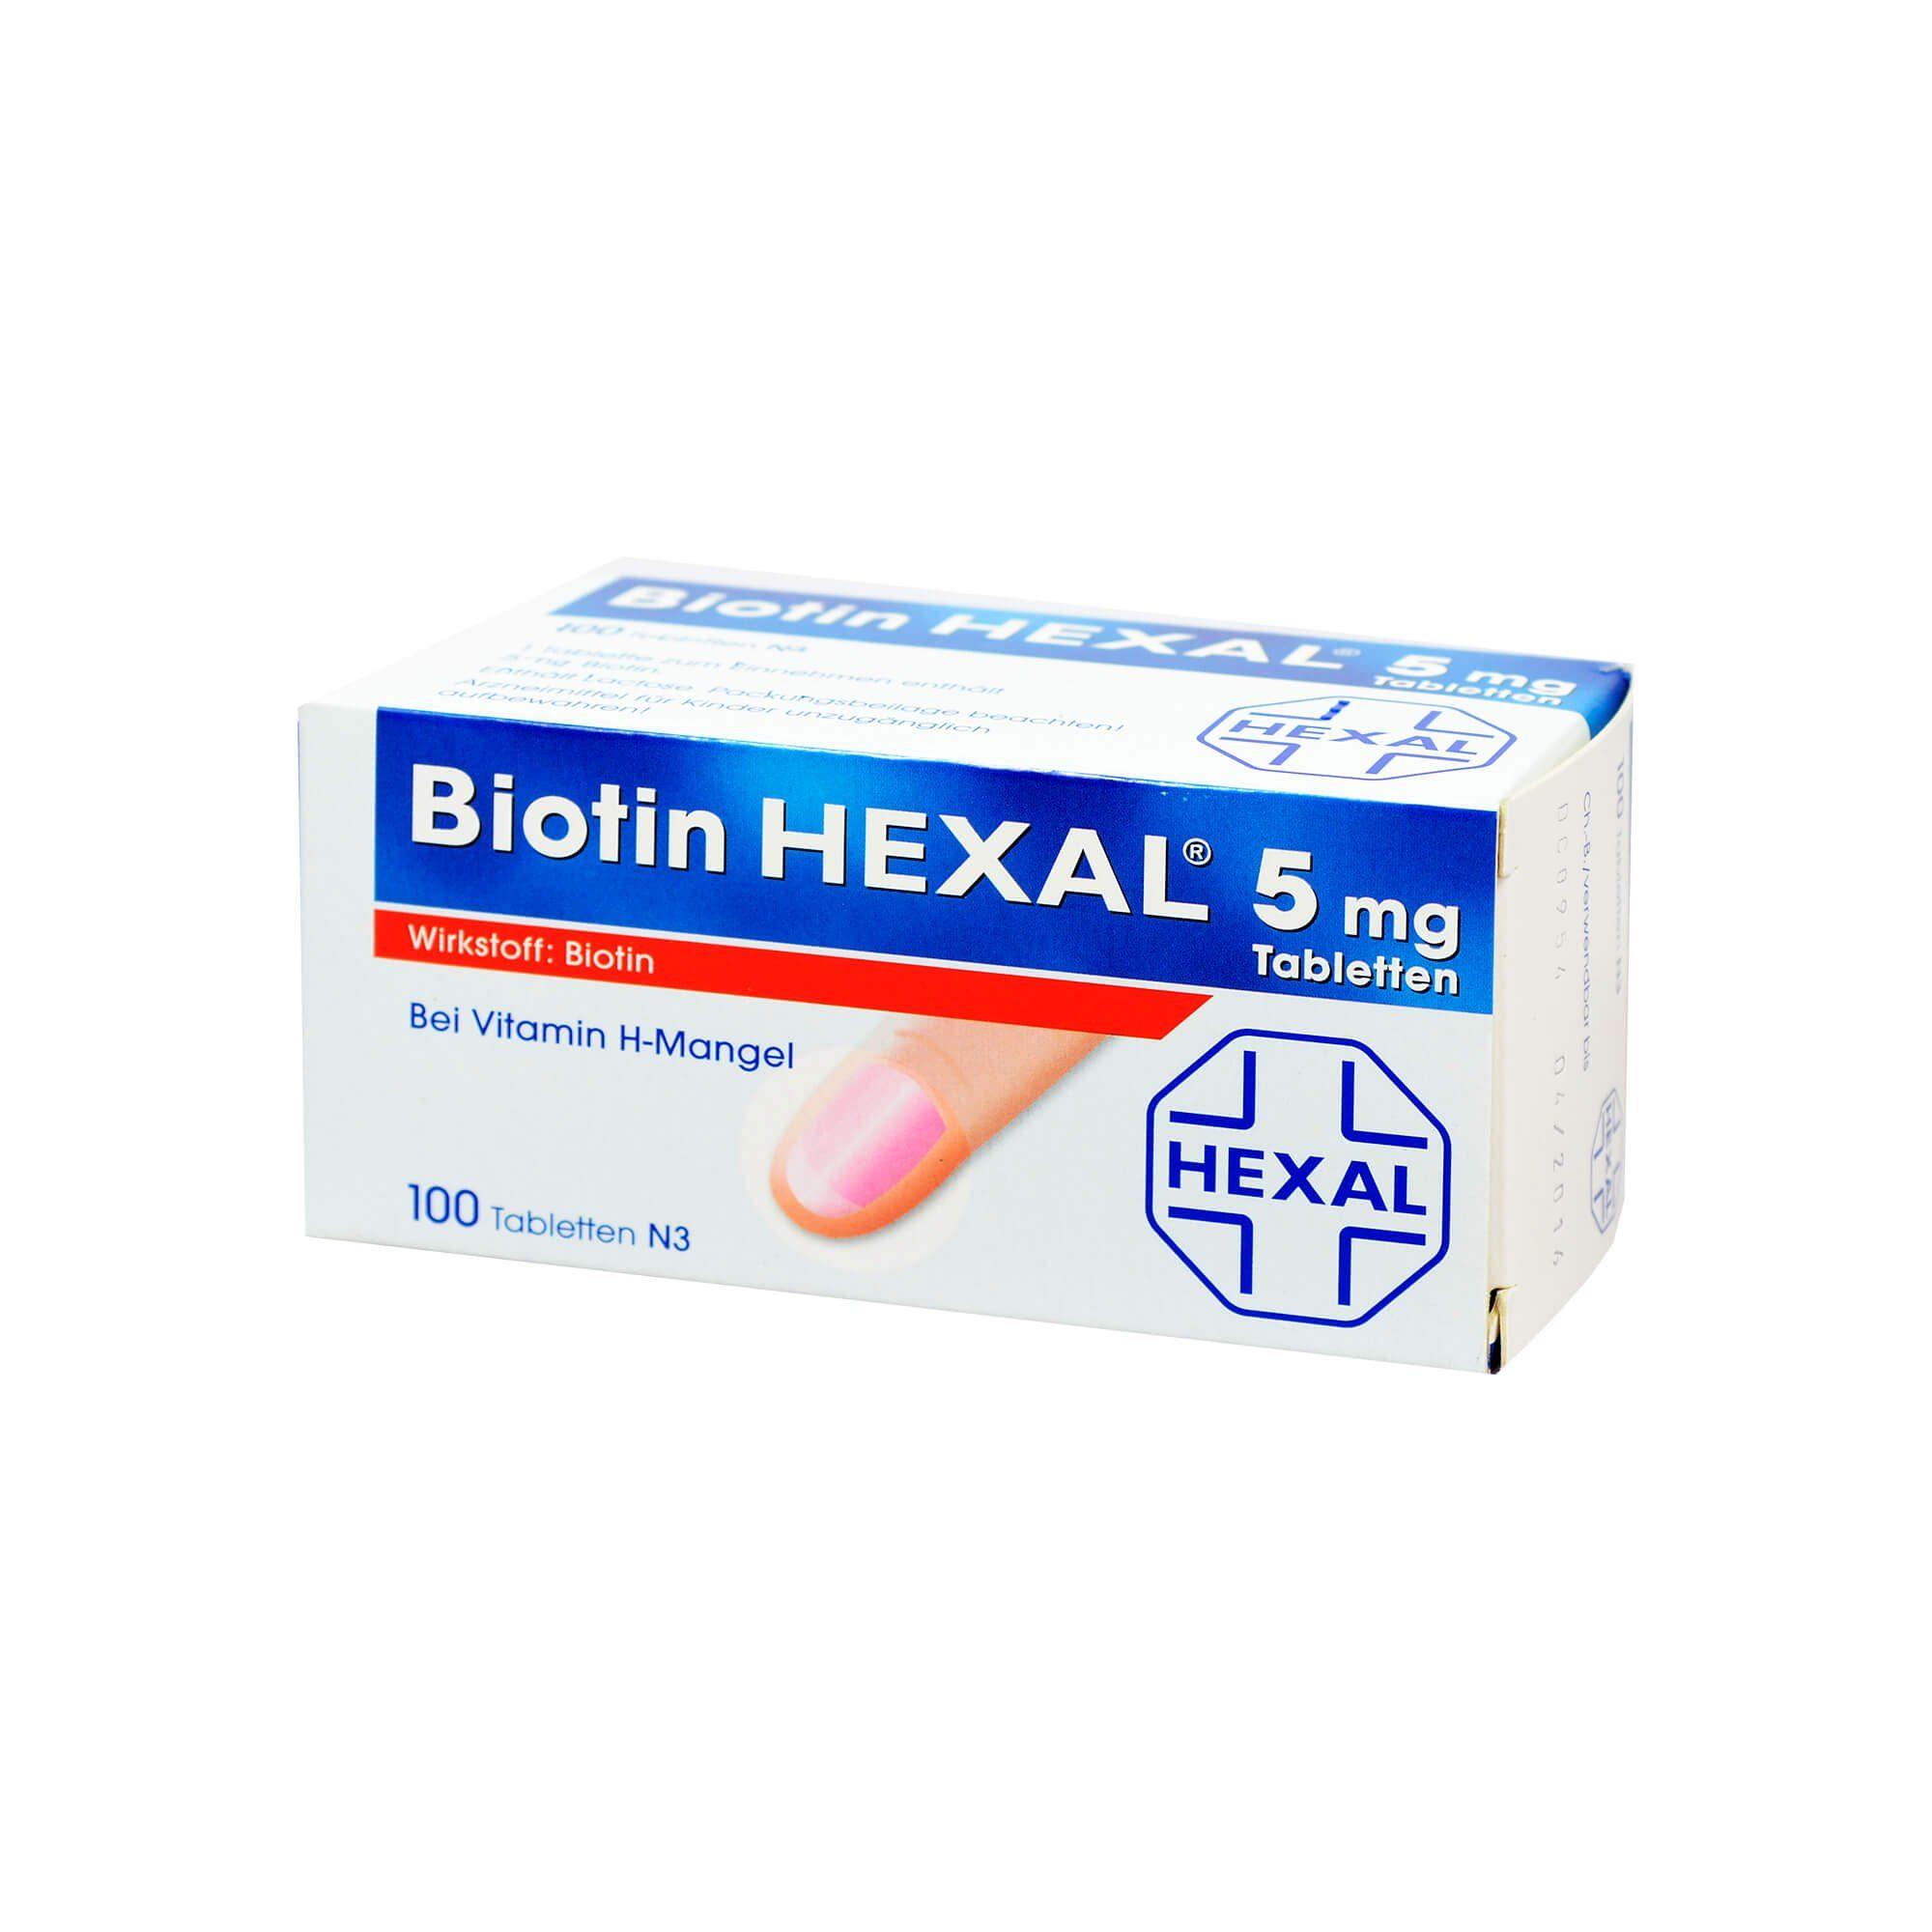 Biotin Hexal 5 mg, 100 St